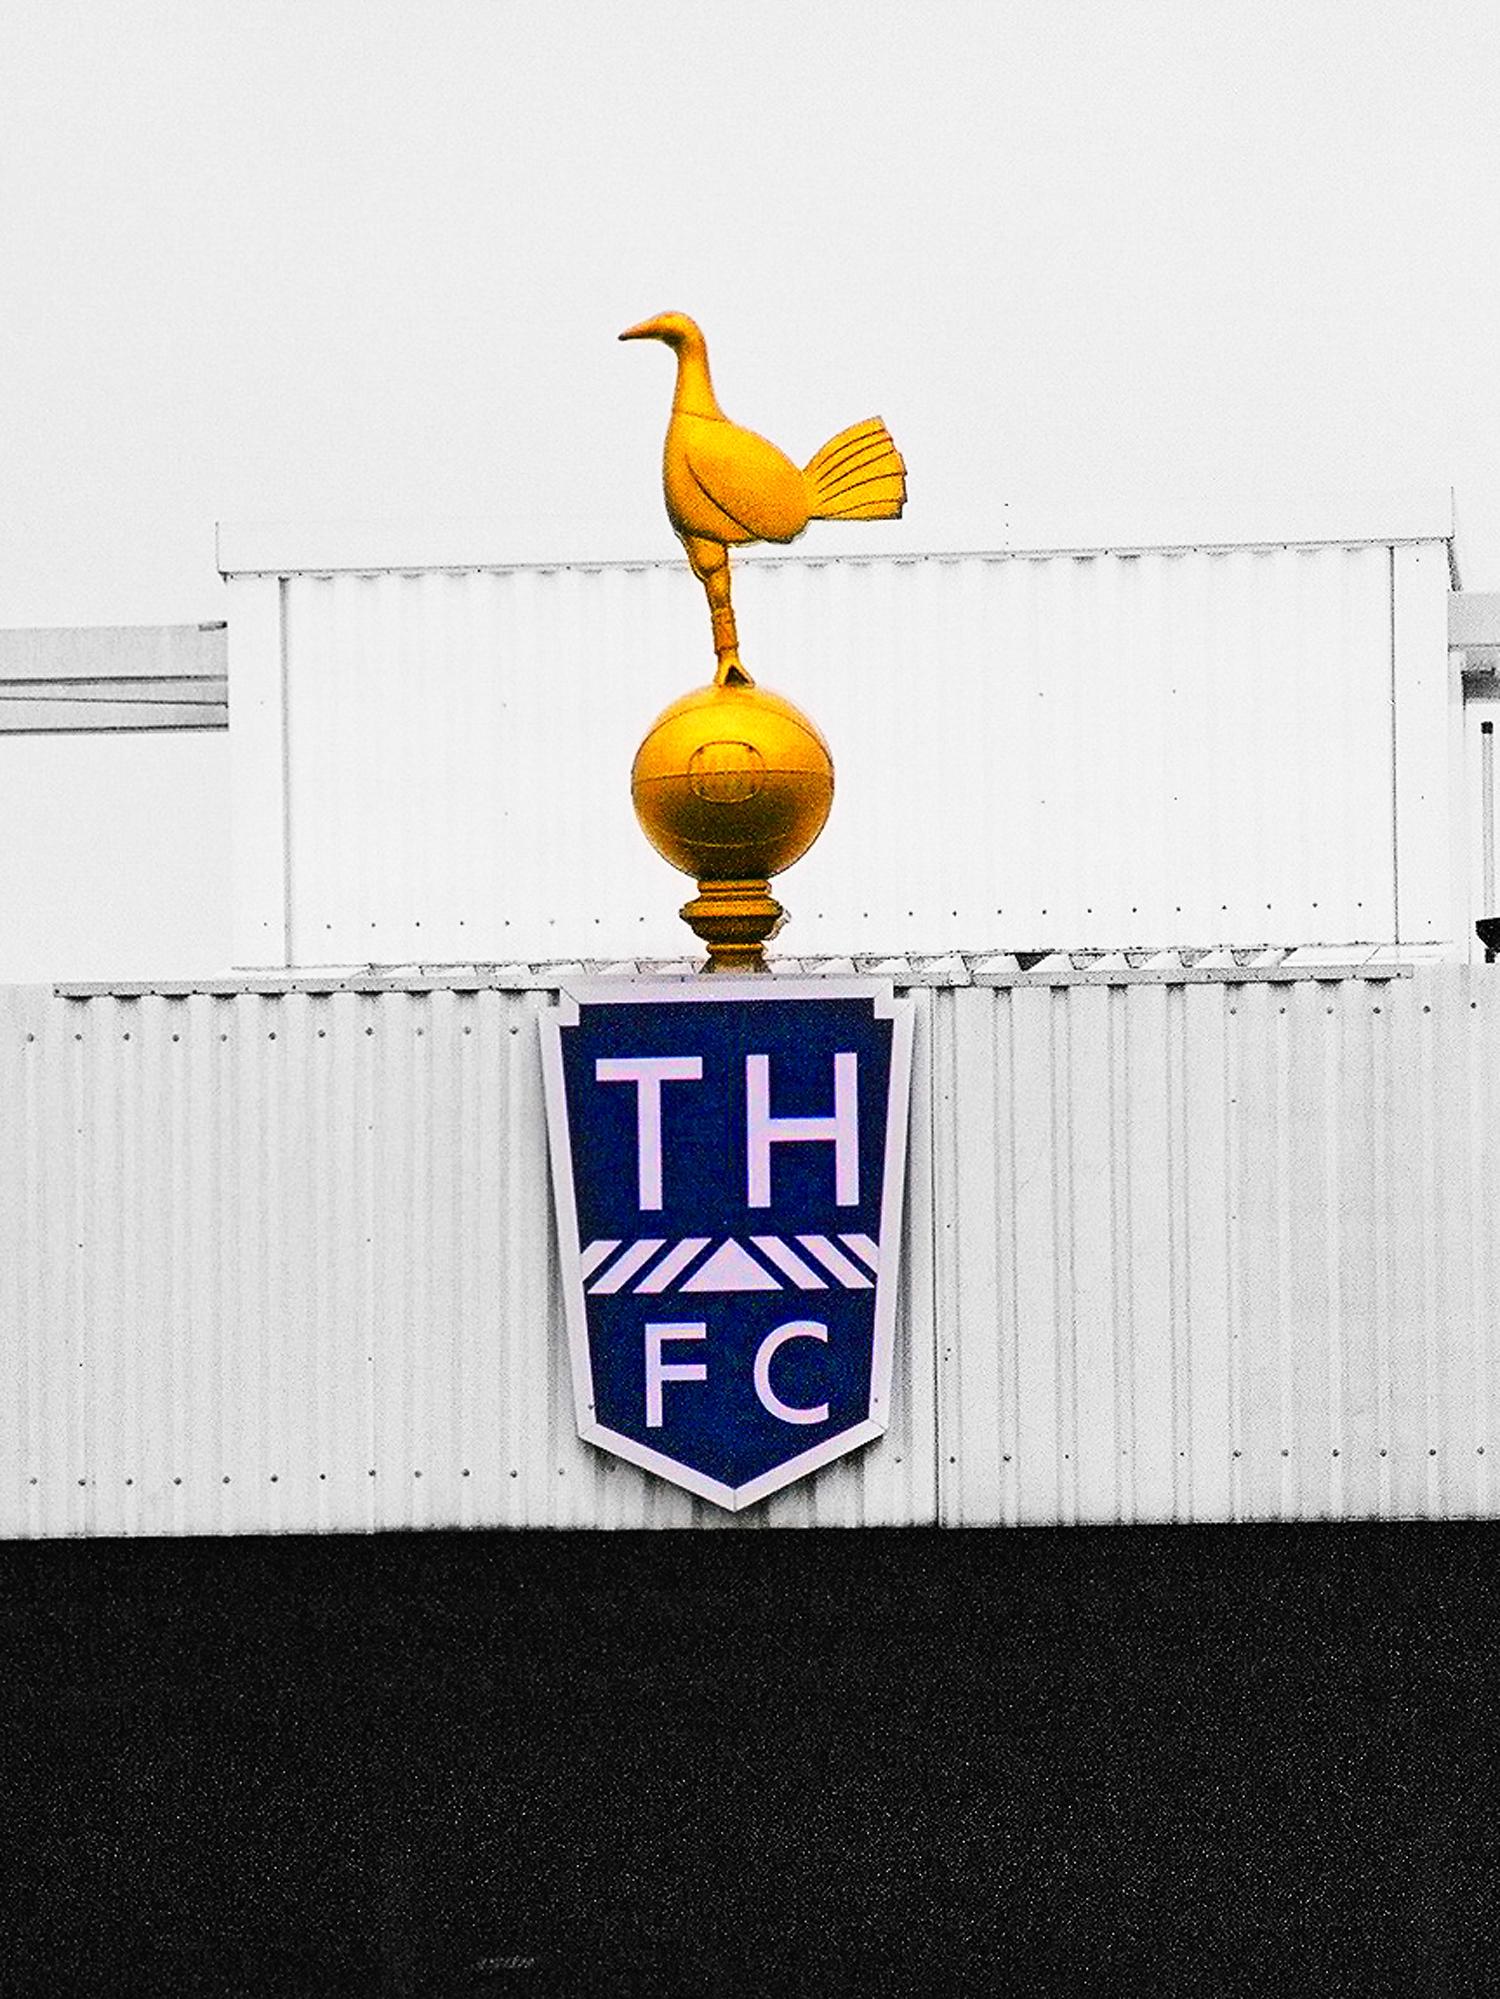 Tottenham Hotspur Football Club